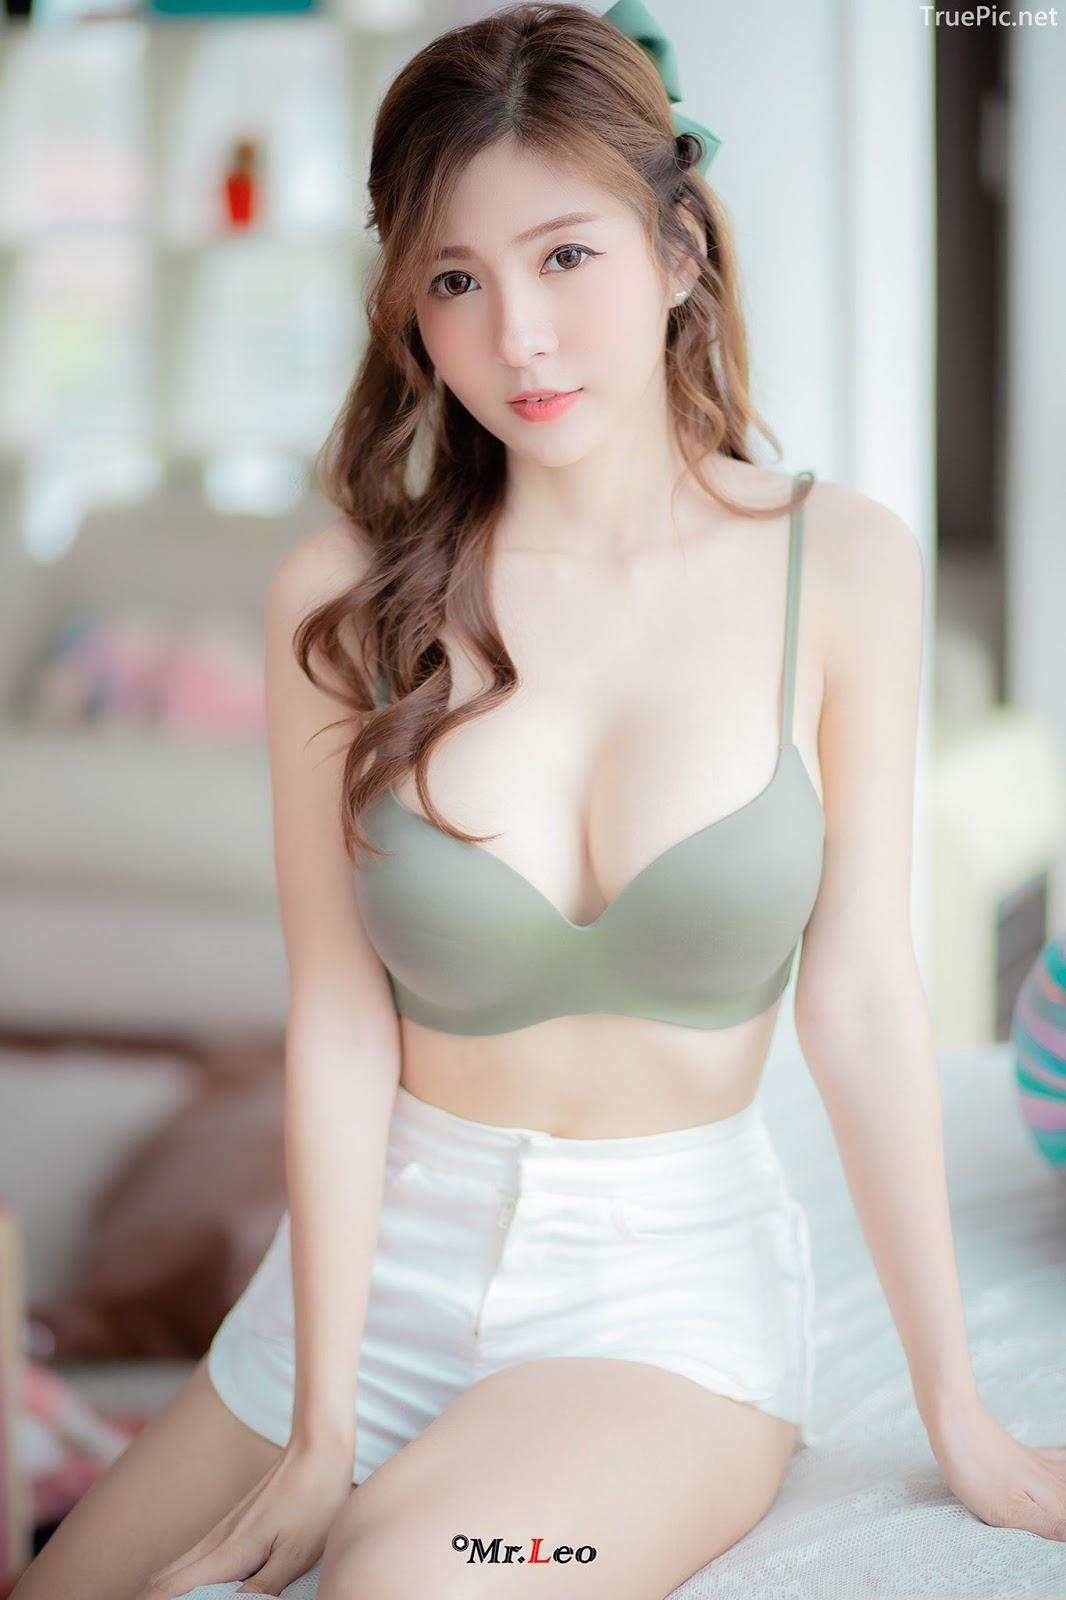 Thailand hot model - Chompoo Radadao Keawla-ied - You're always my good dream - TruePic.net - Picture 3